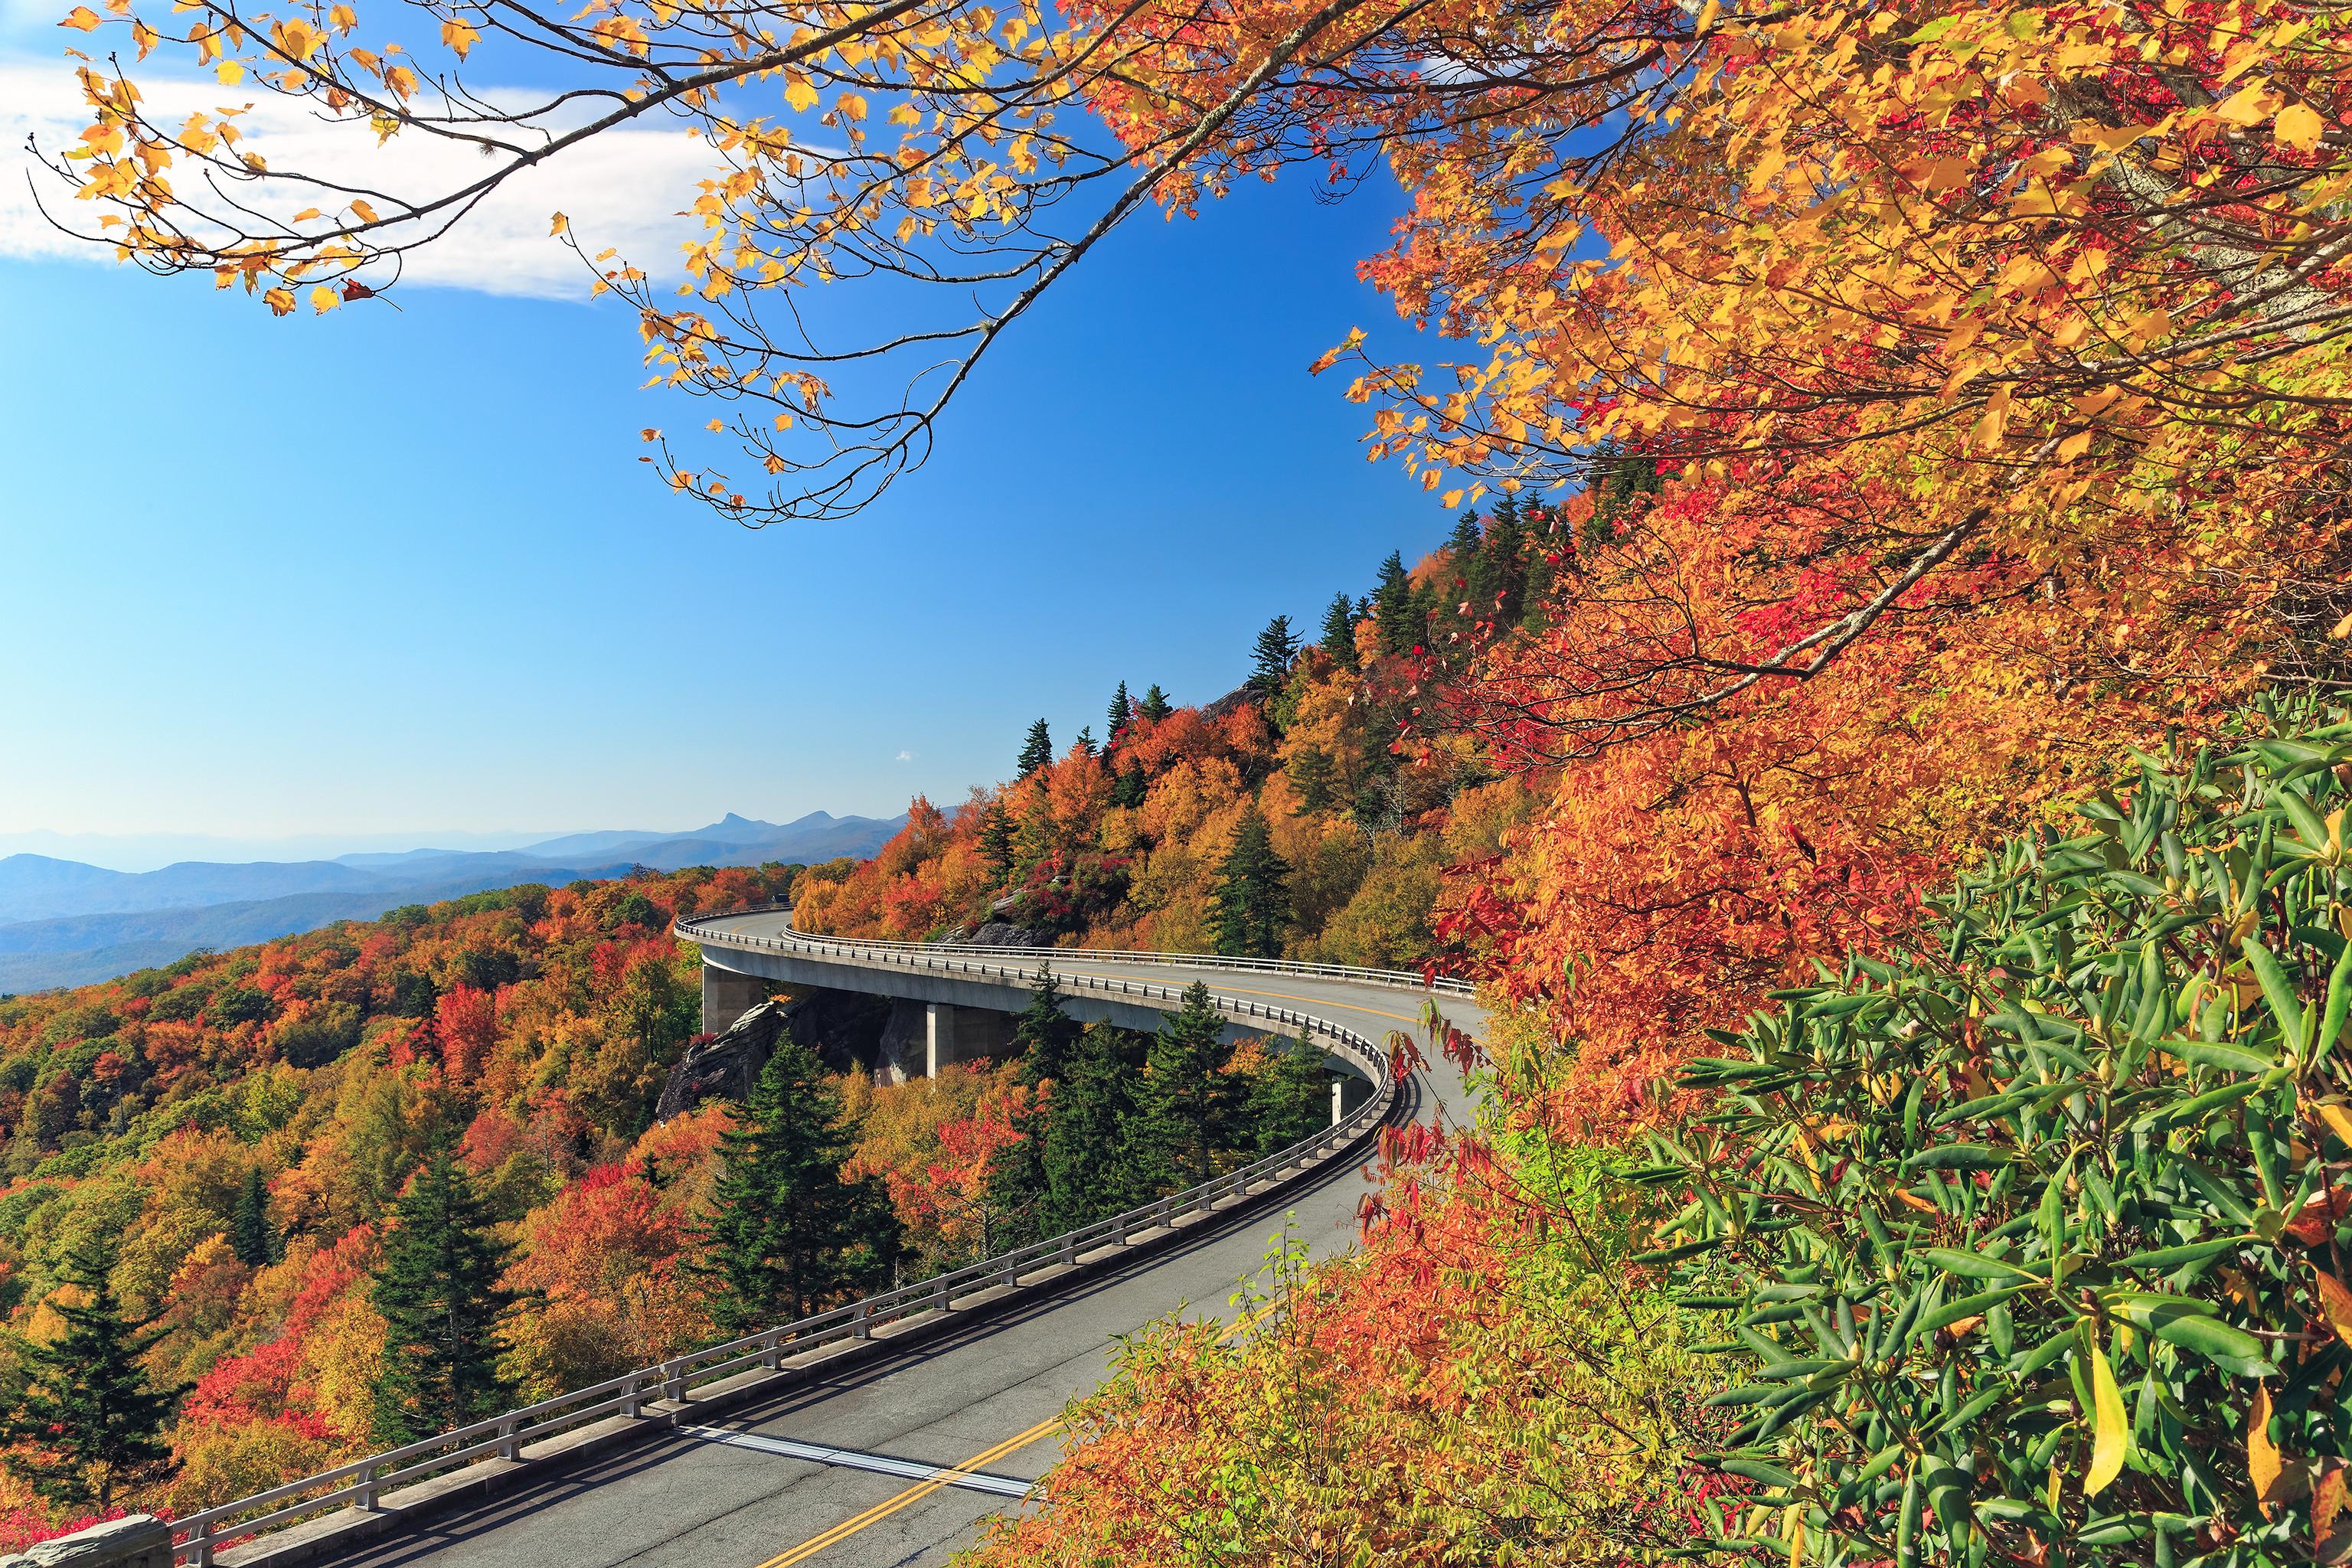 Linn Cove Viaduct, Северная Каролина, осень